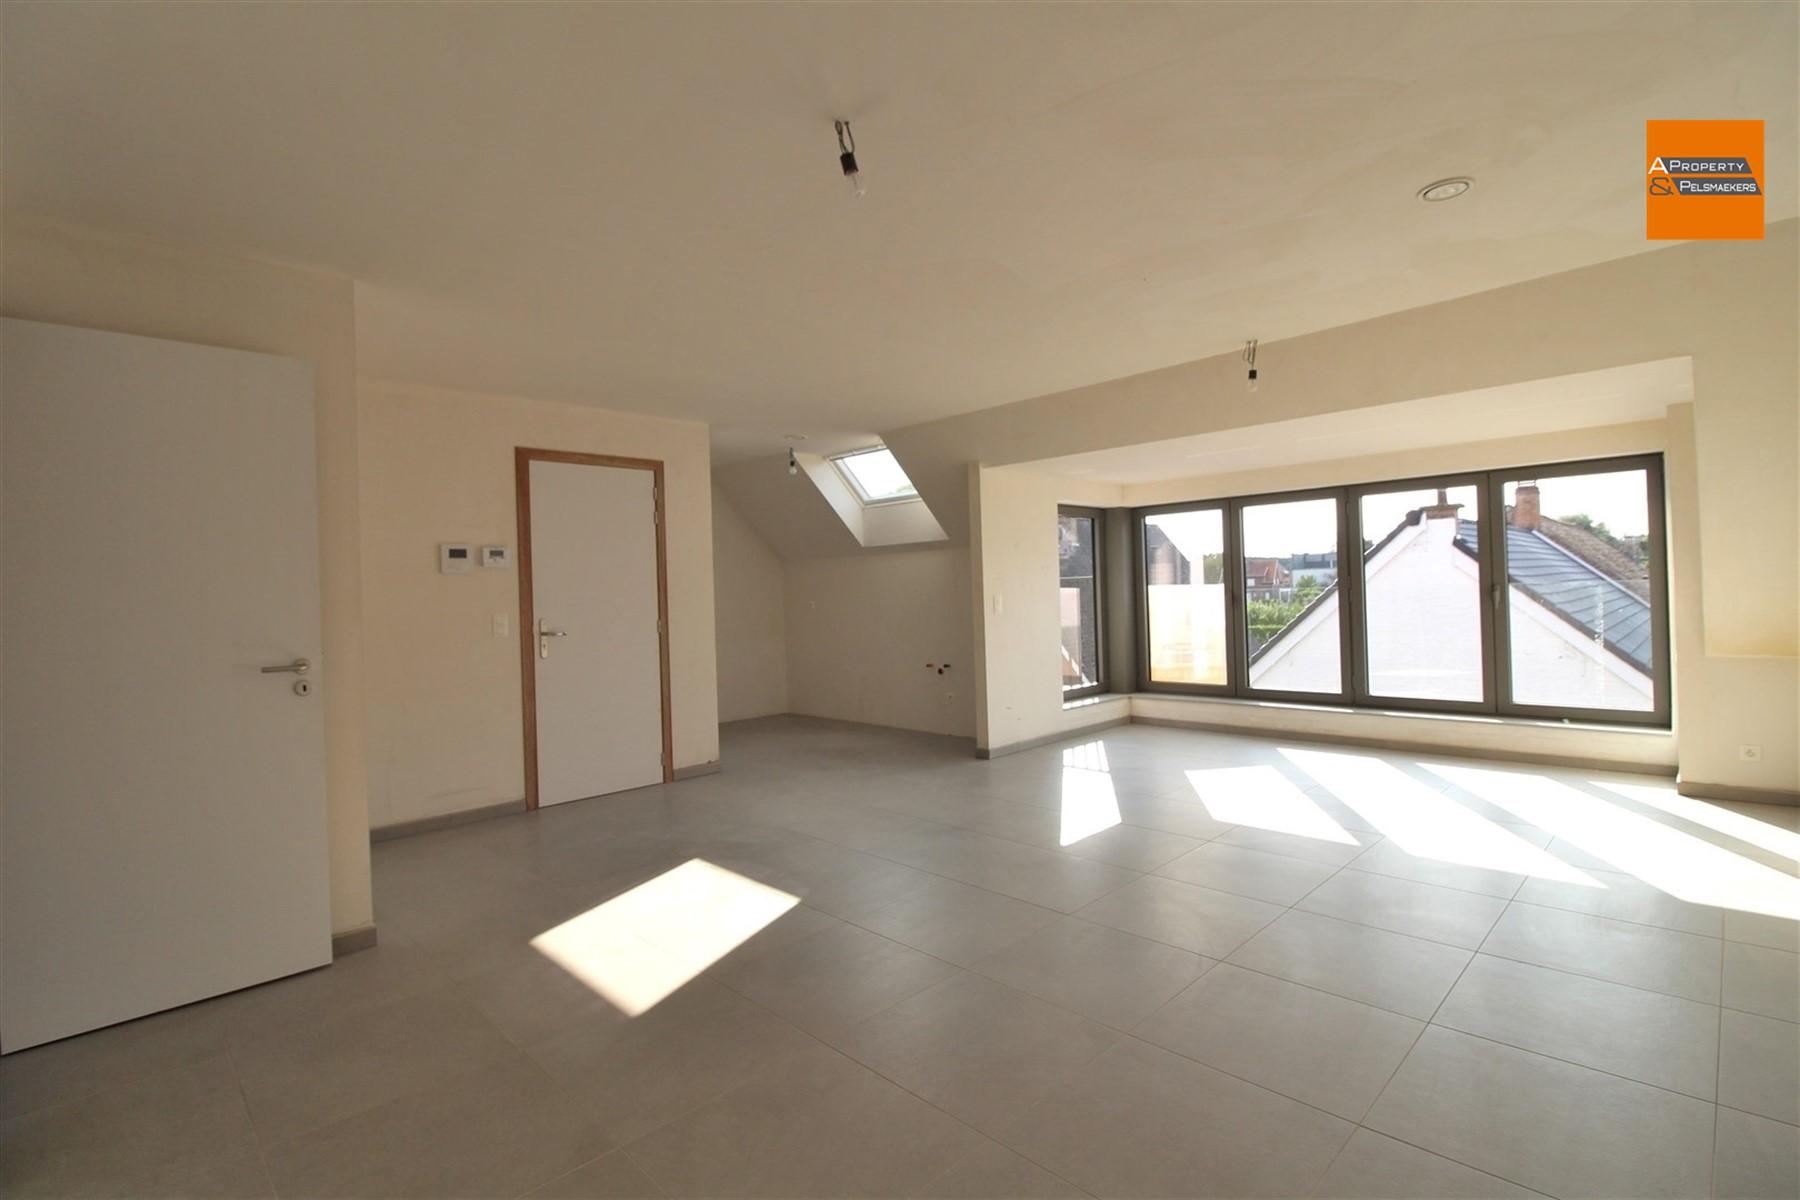 Real estate project : Frans Dottermansstraat 22 Bertem IN BERTEM (3060) - Price